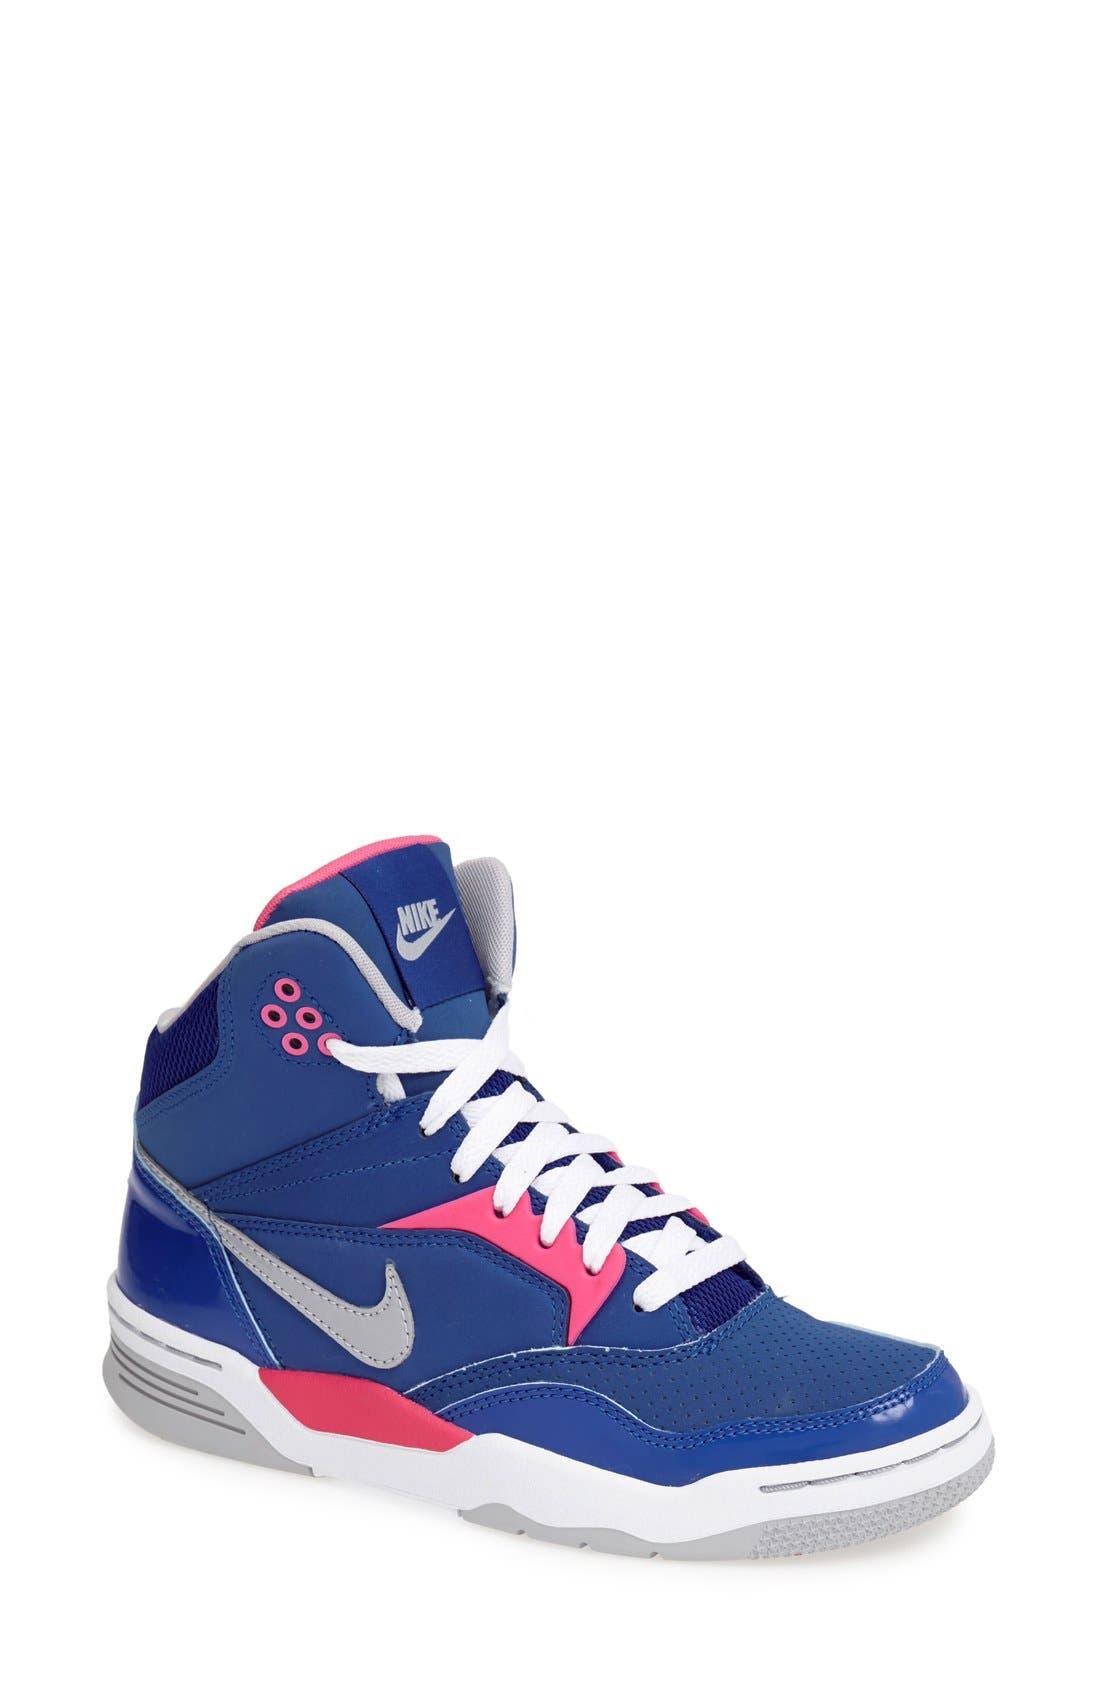 Alternate Image 1 Selected - Nike 'Base Flight 14 Hi' Sneaker (Women)